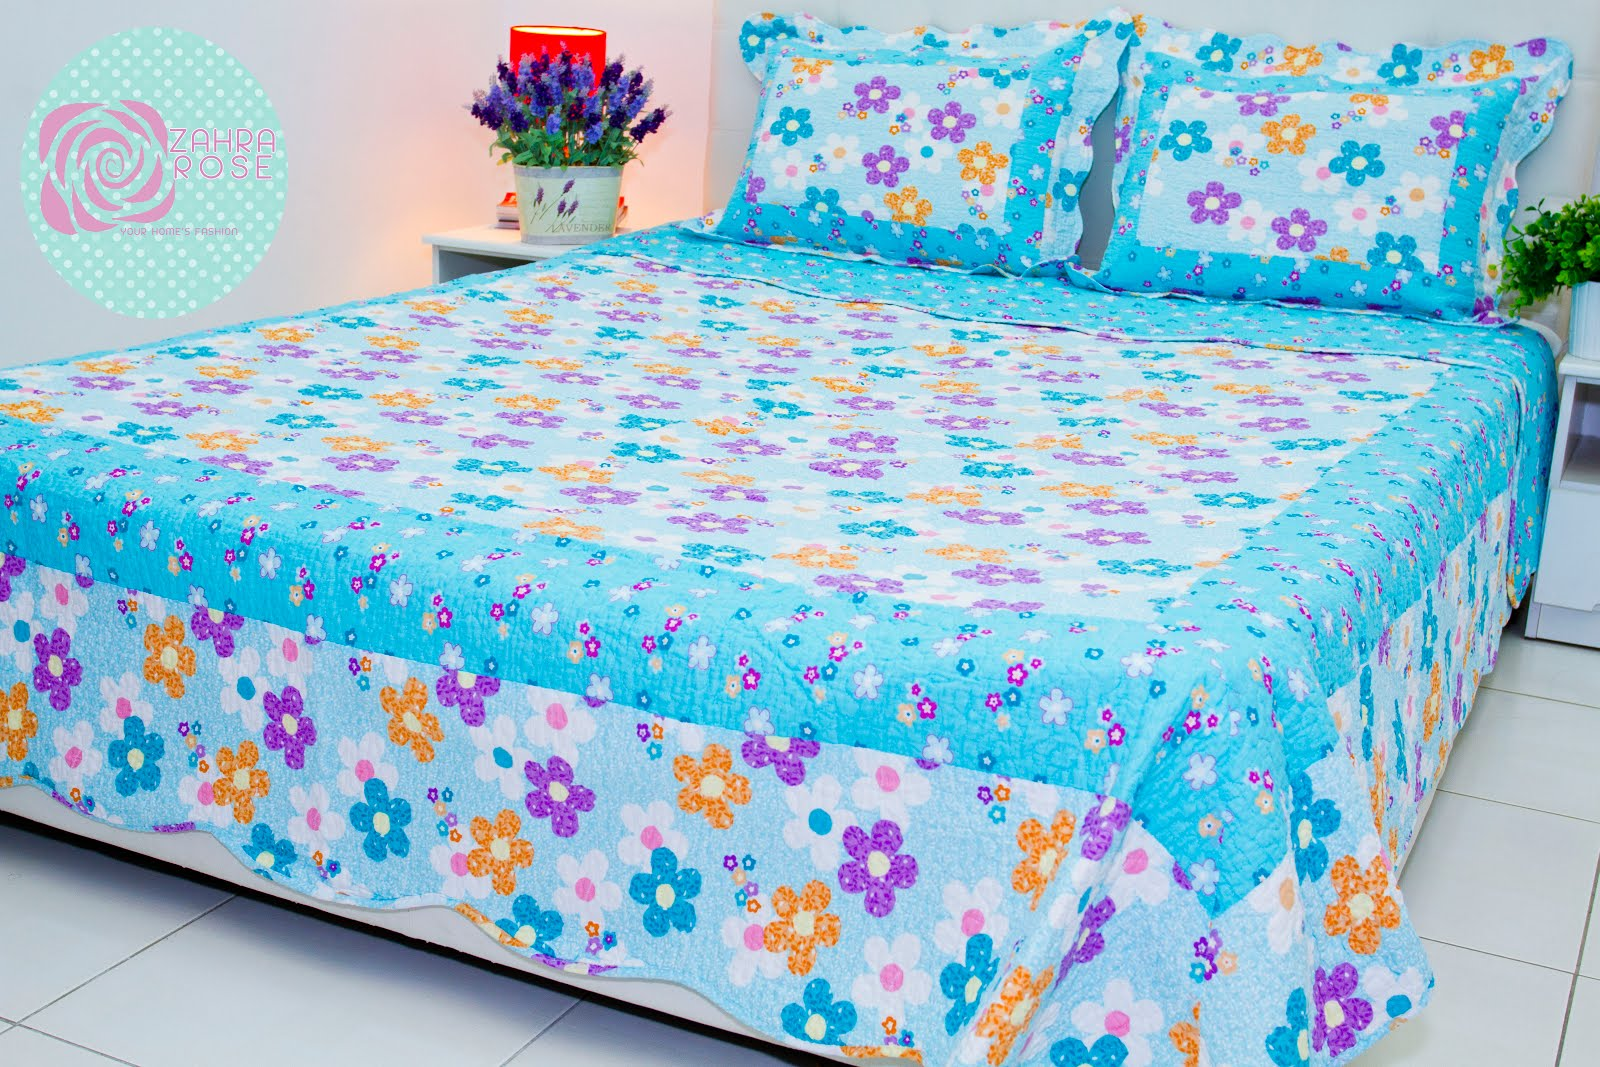 Patchwork bed sheets patterns - Zahra Rose Design Cotton Patchwork Bed Sheet